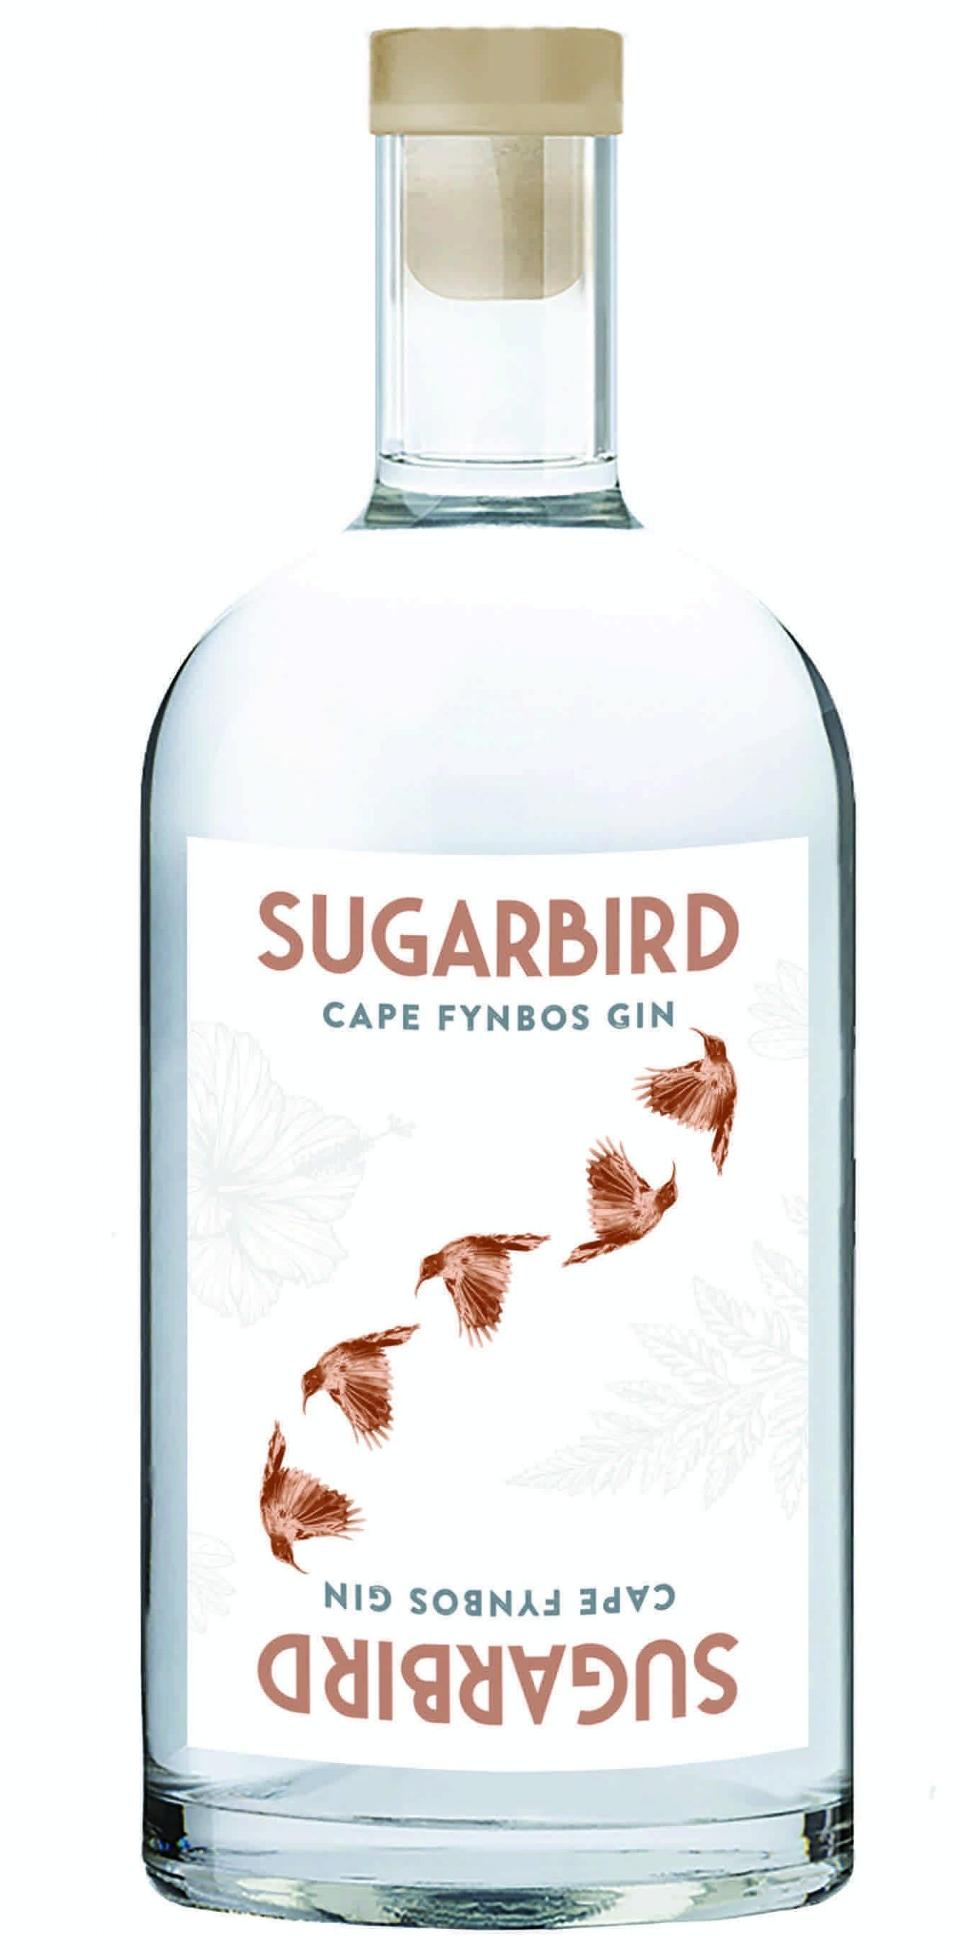 Sugarbird_1Litre Bottle-1.jpg